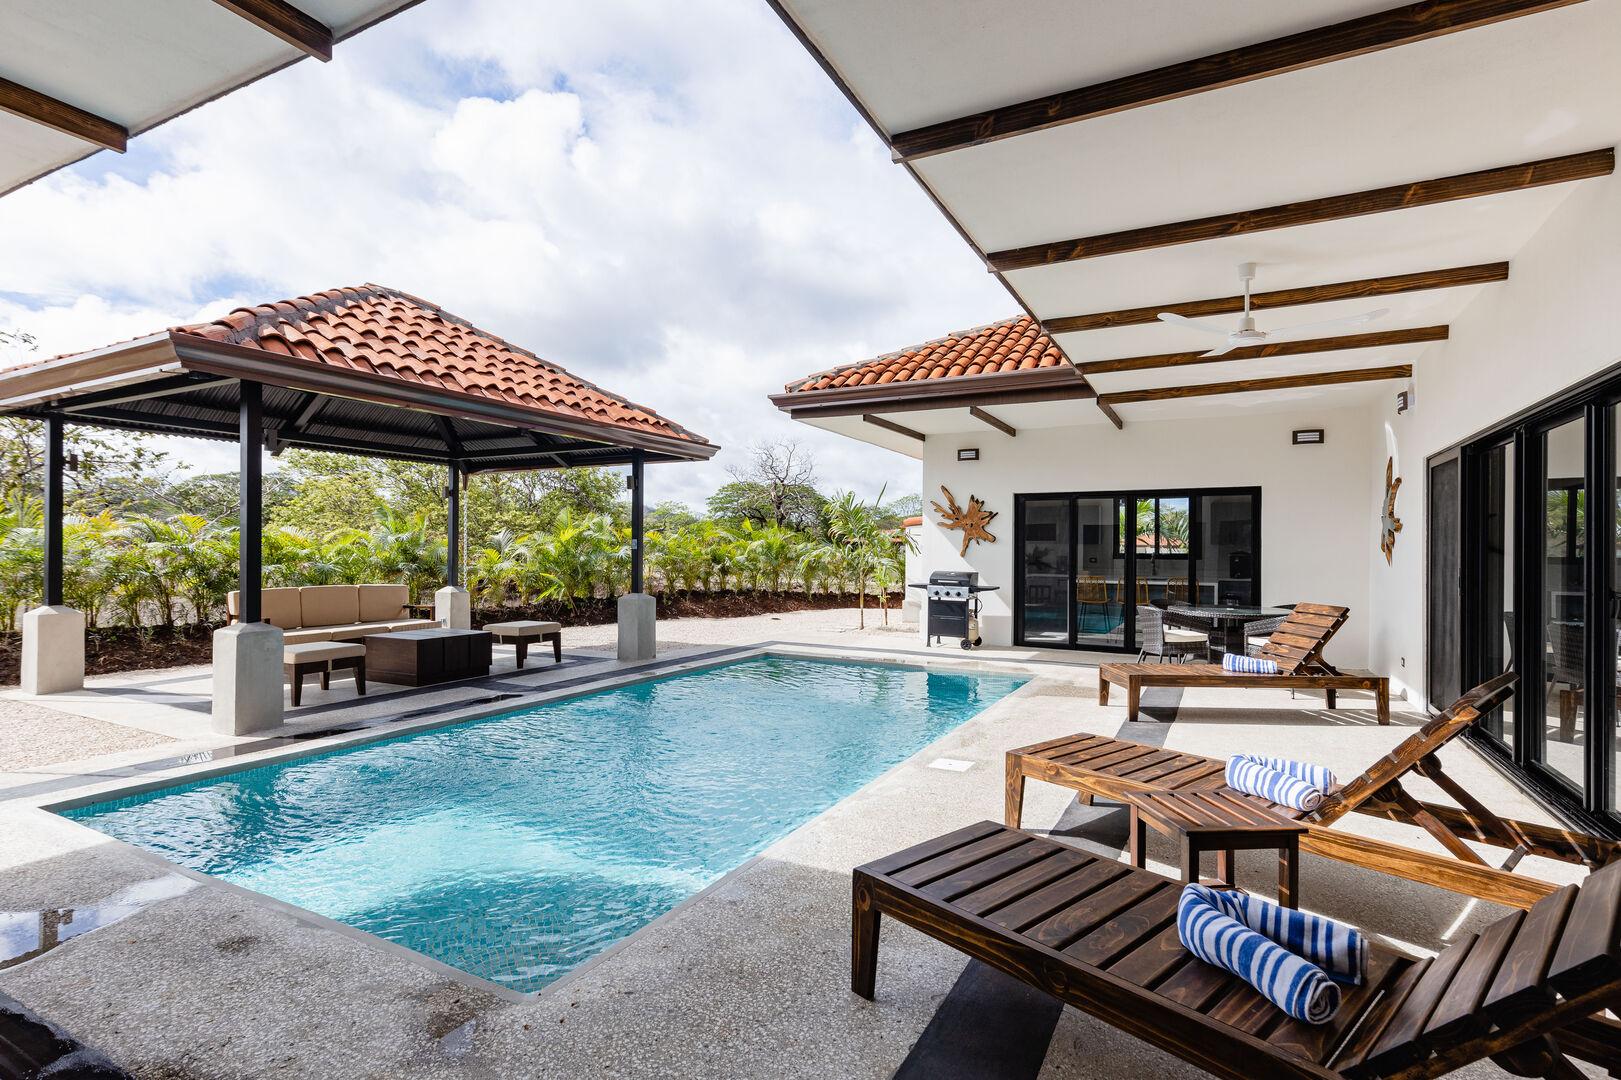 Casa Savanna Costa Rica beach house rentals